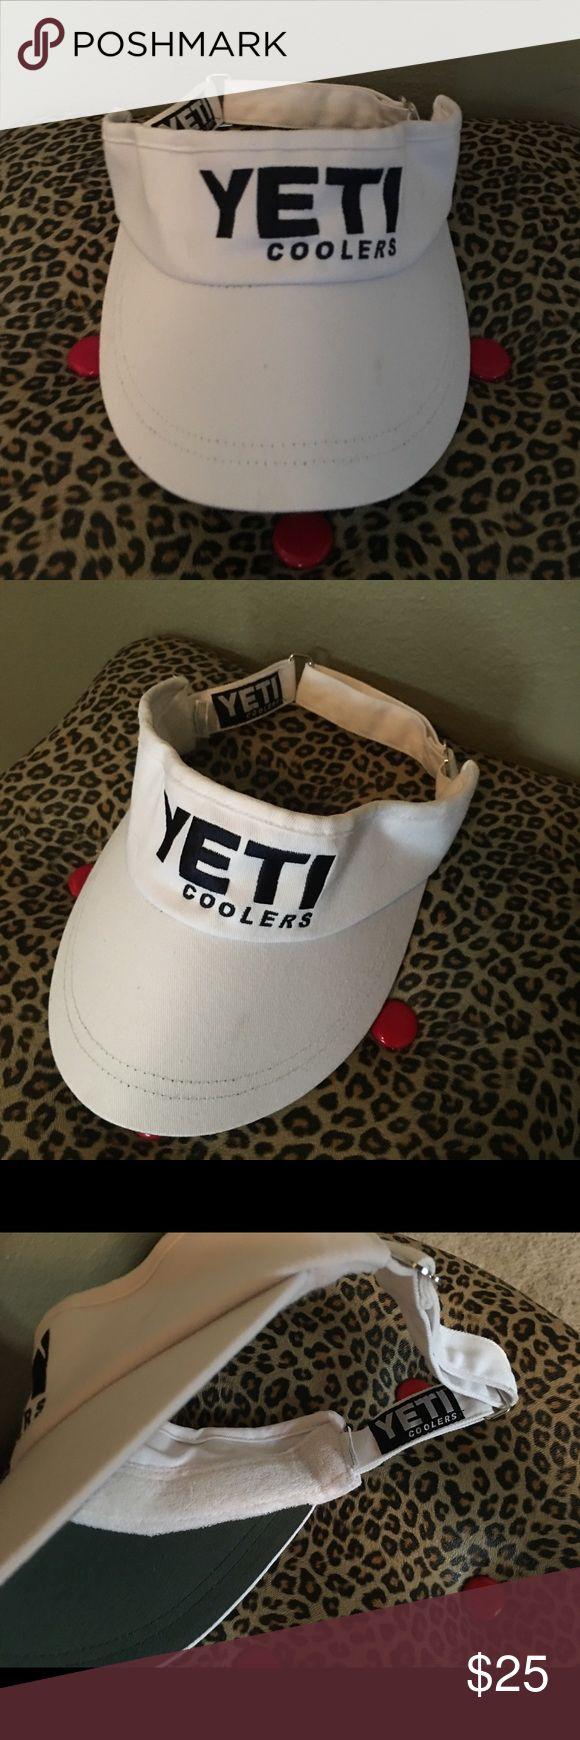 Yeti Sun Visor Awesome white & navy super popular Yeti sun visor ! Perfect summer Visor for the outdoors person :) Yeti Accessories Hats